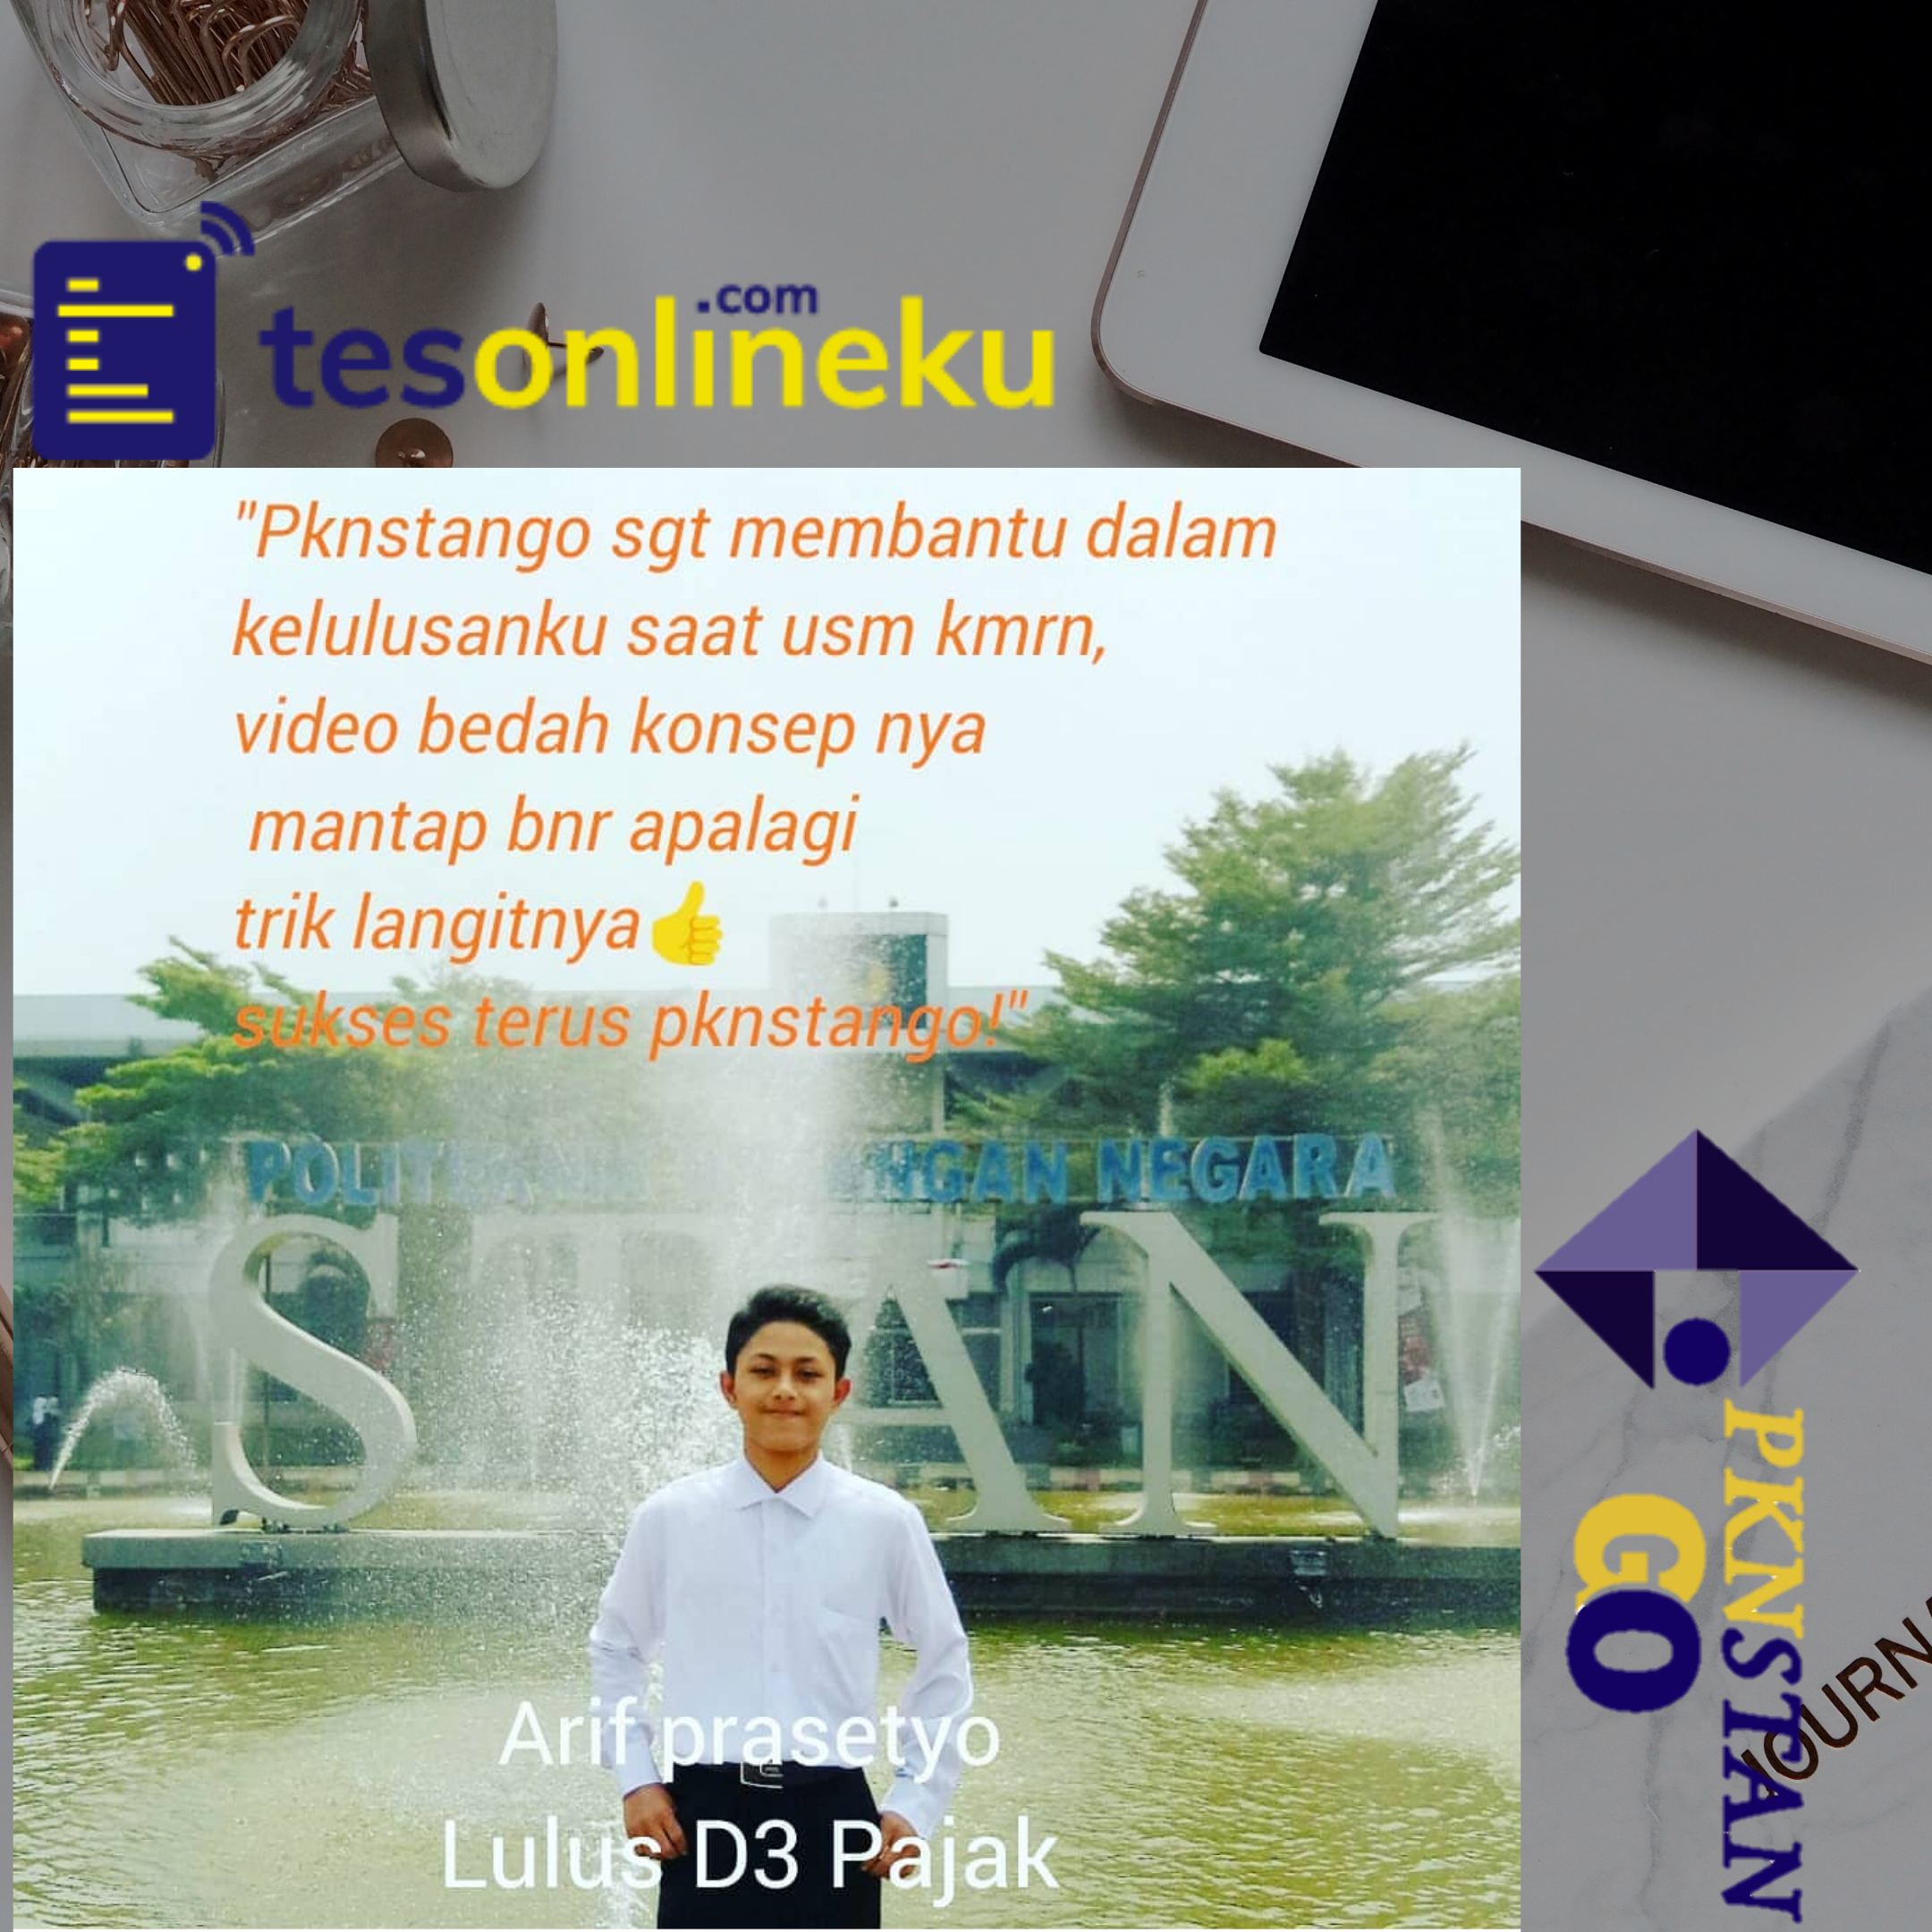 Arif Prasetyo (Lulus D 3 Pajak)